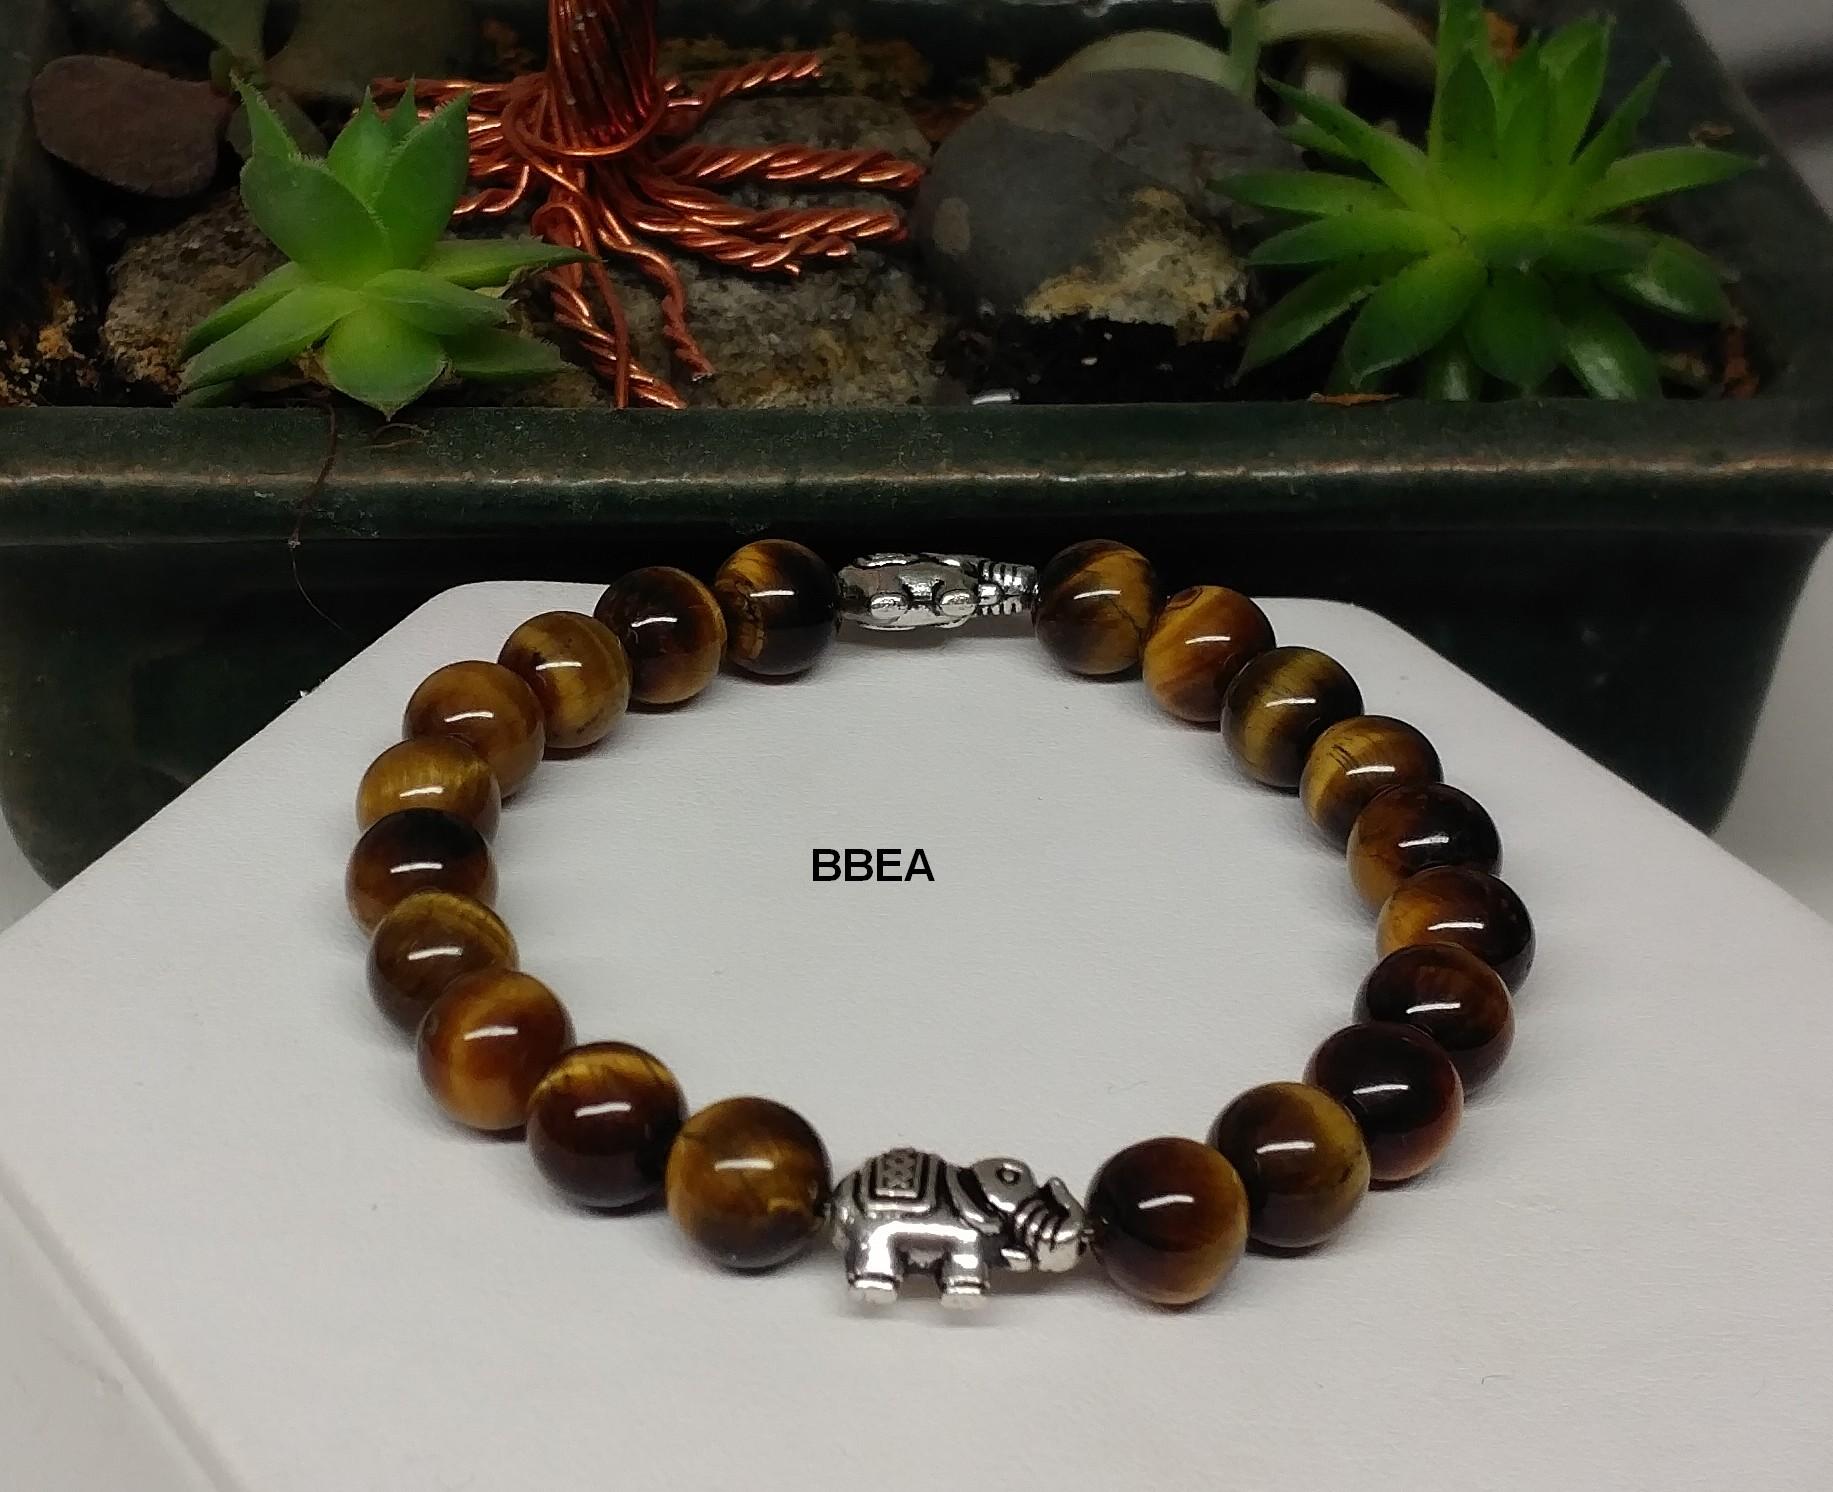 Bracelet oeil de tigre 1 1